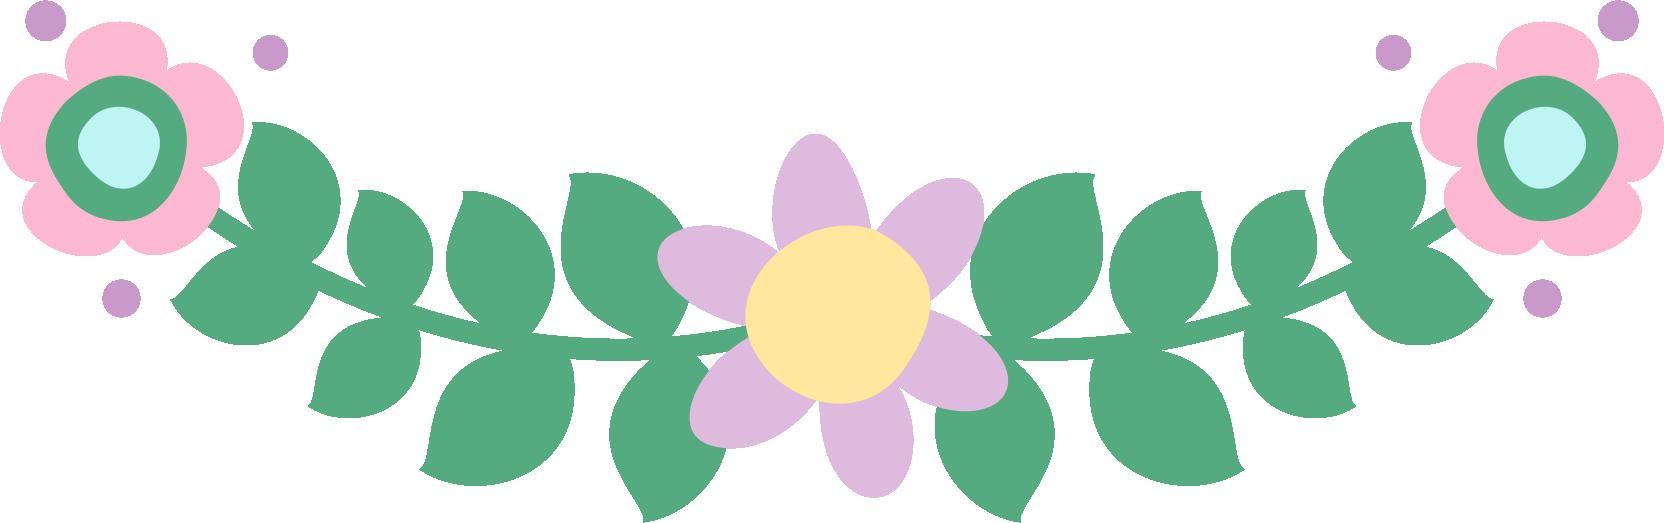 4shared - Ver todas las imágenes de la carpeta PNG | ดอกไม้ | Pinterest